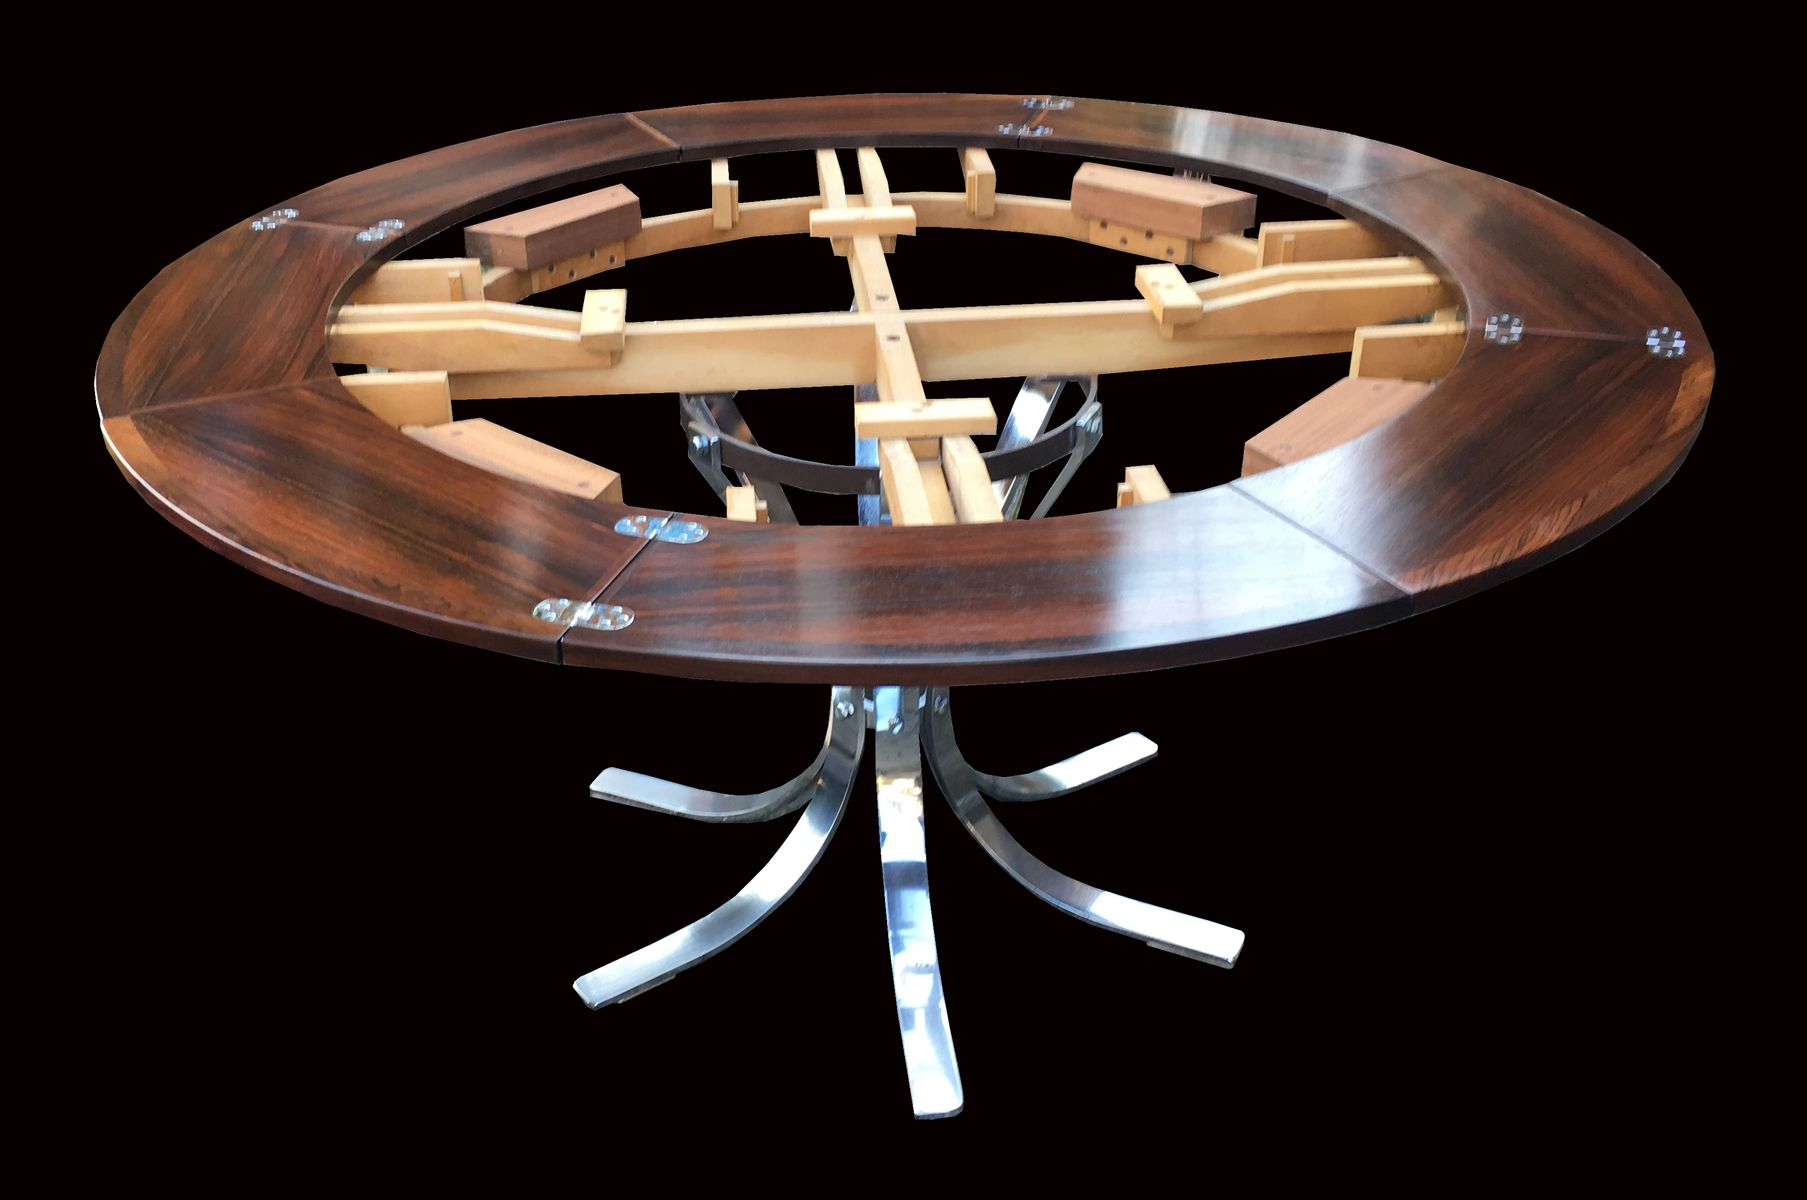 Table De Salle Manger Ronde Circulaire Rallonge Flip